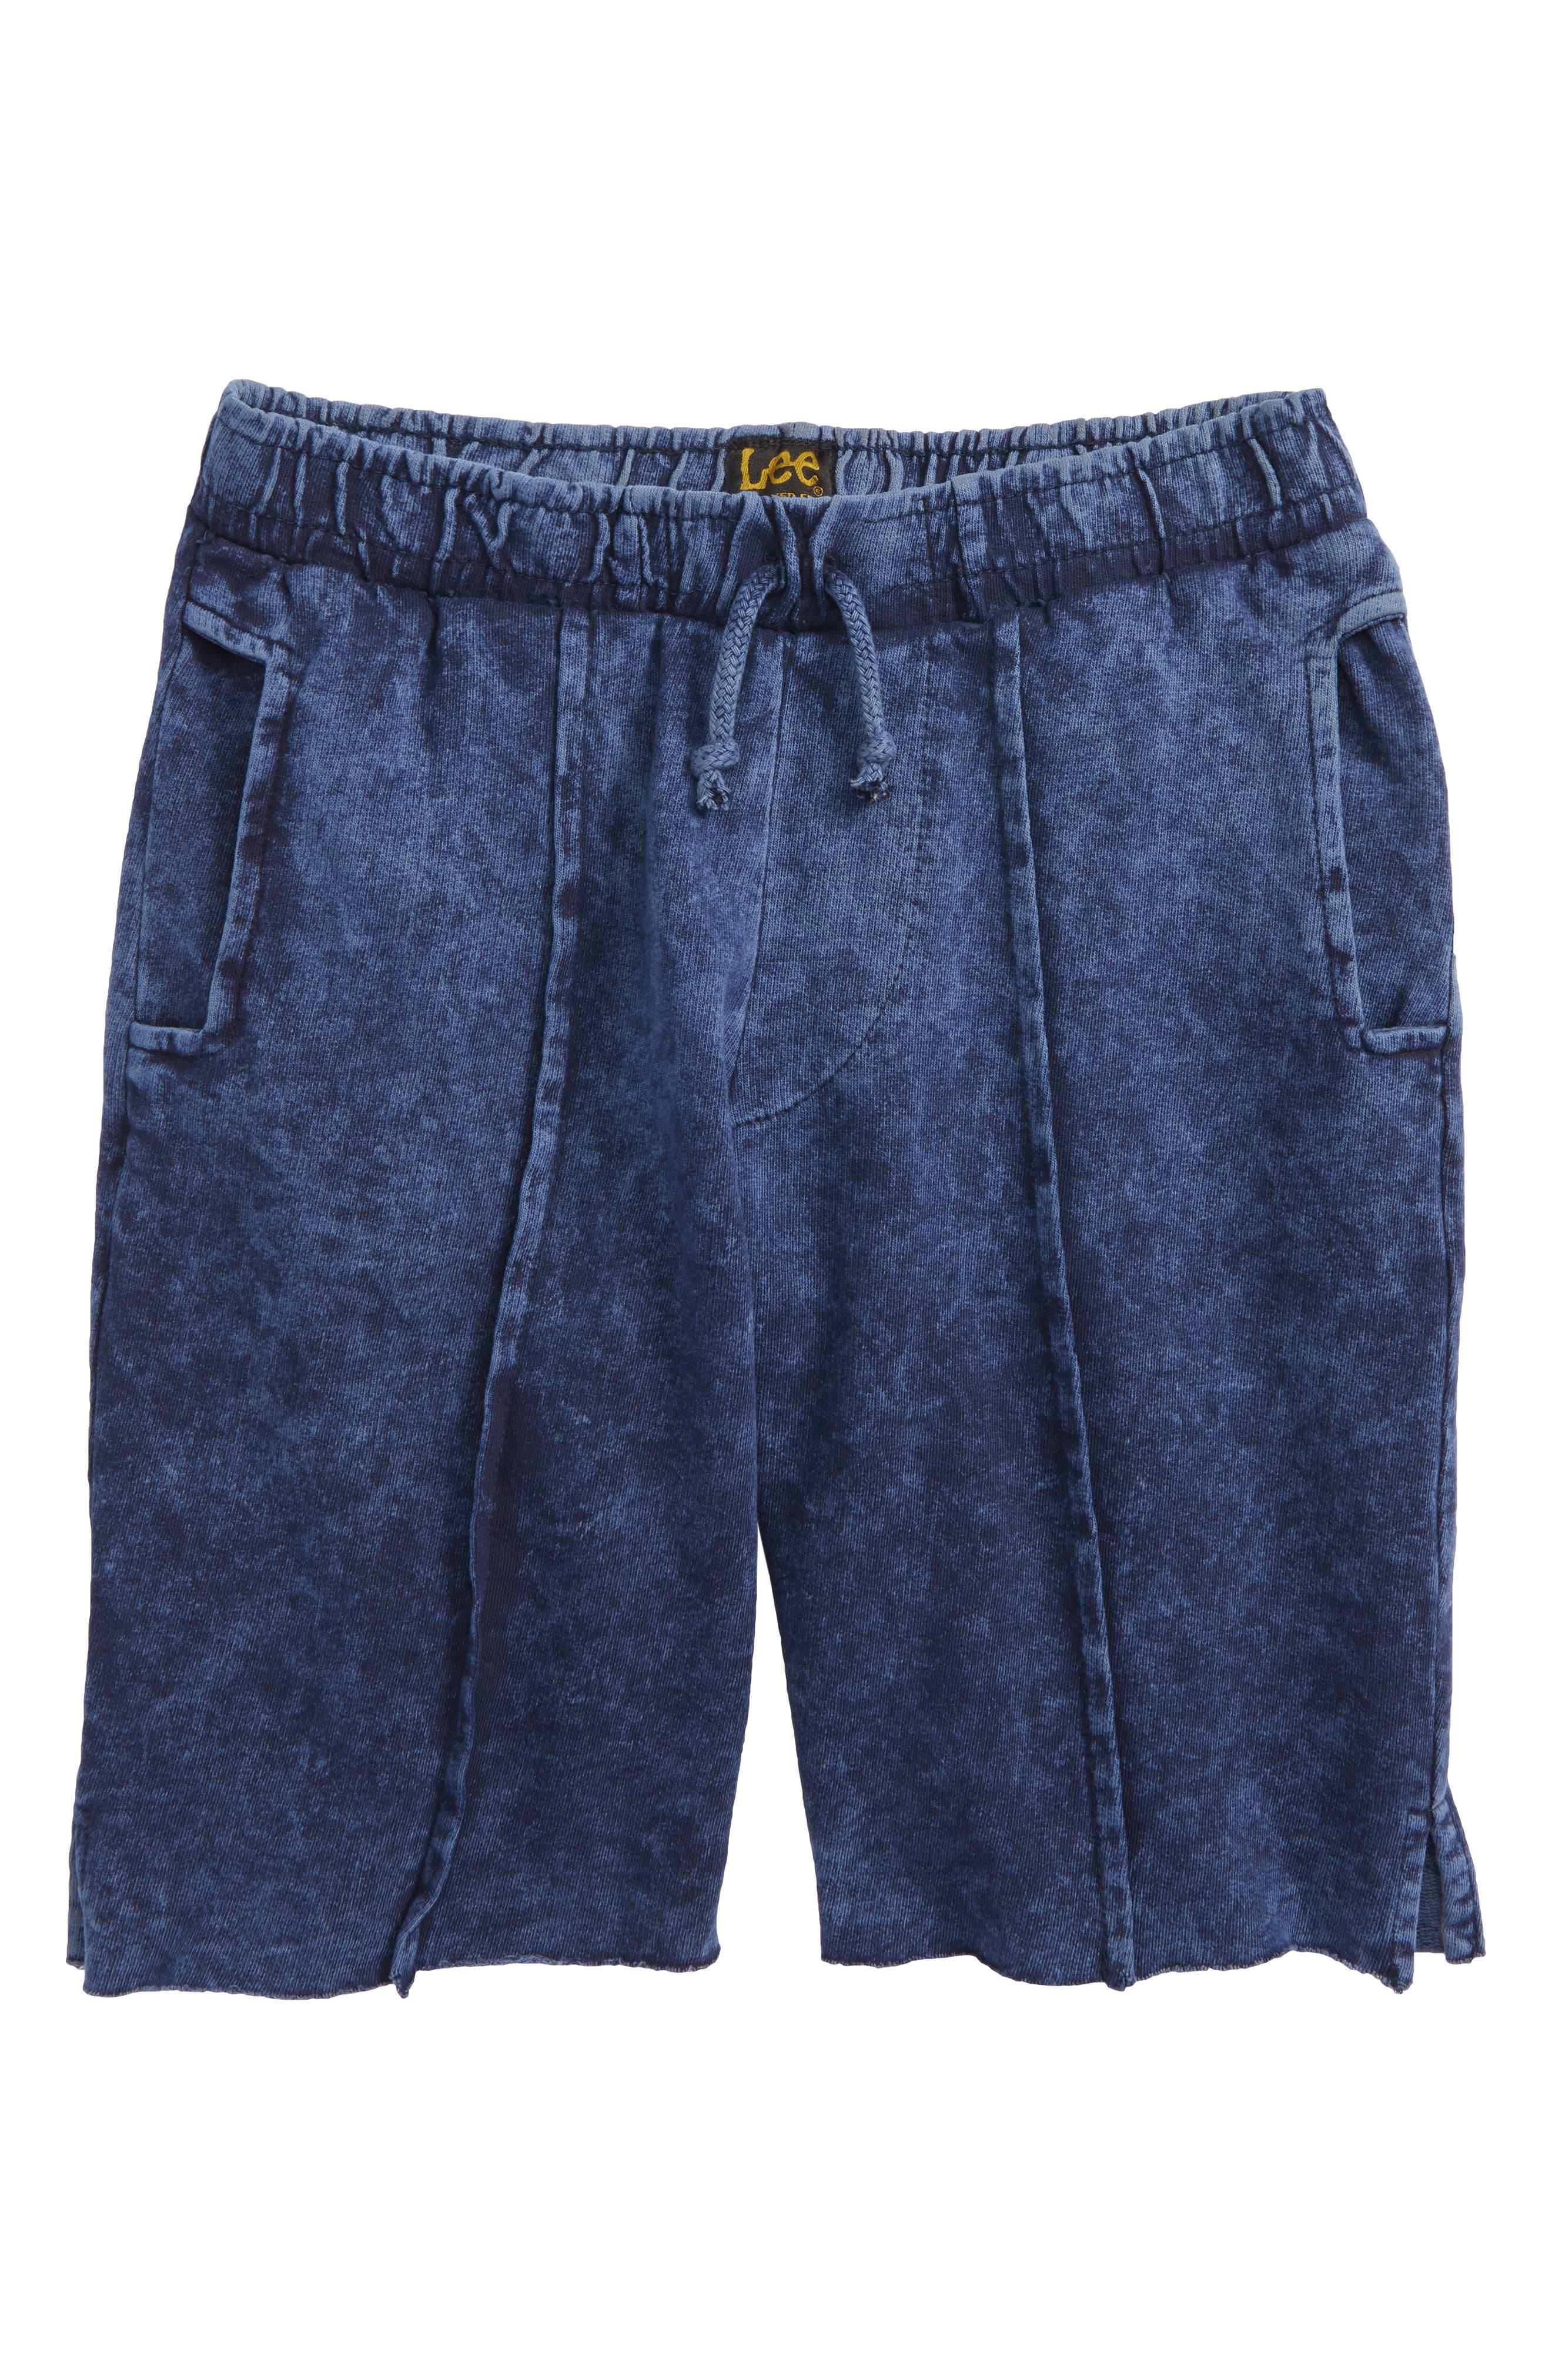 Acid Wash Pull-On Denim Shorts,                         Main,                         color, Navy